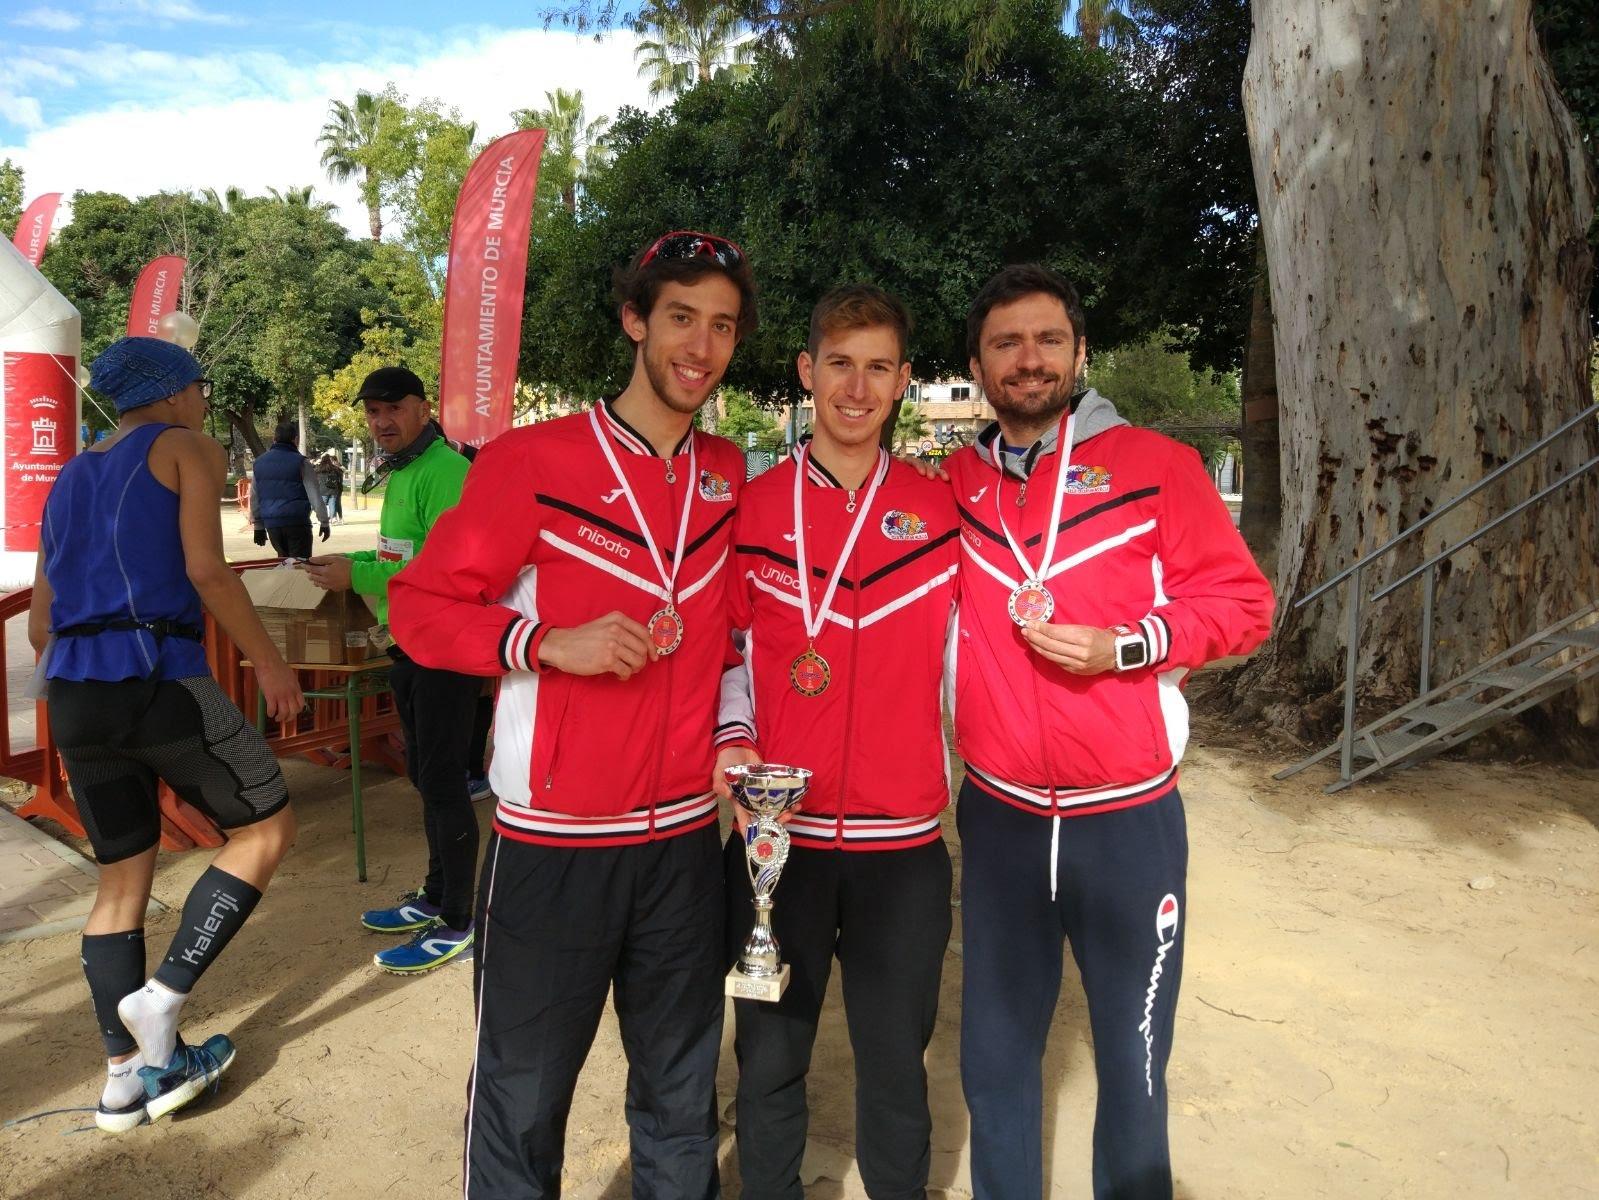 Podio_Club_Triatln_Murcia_Unidata_3